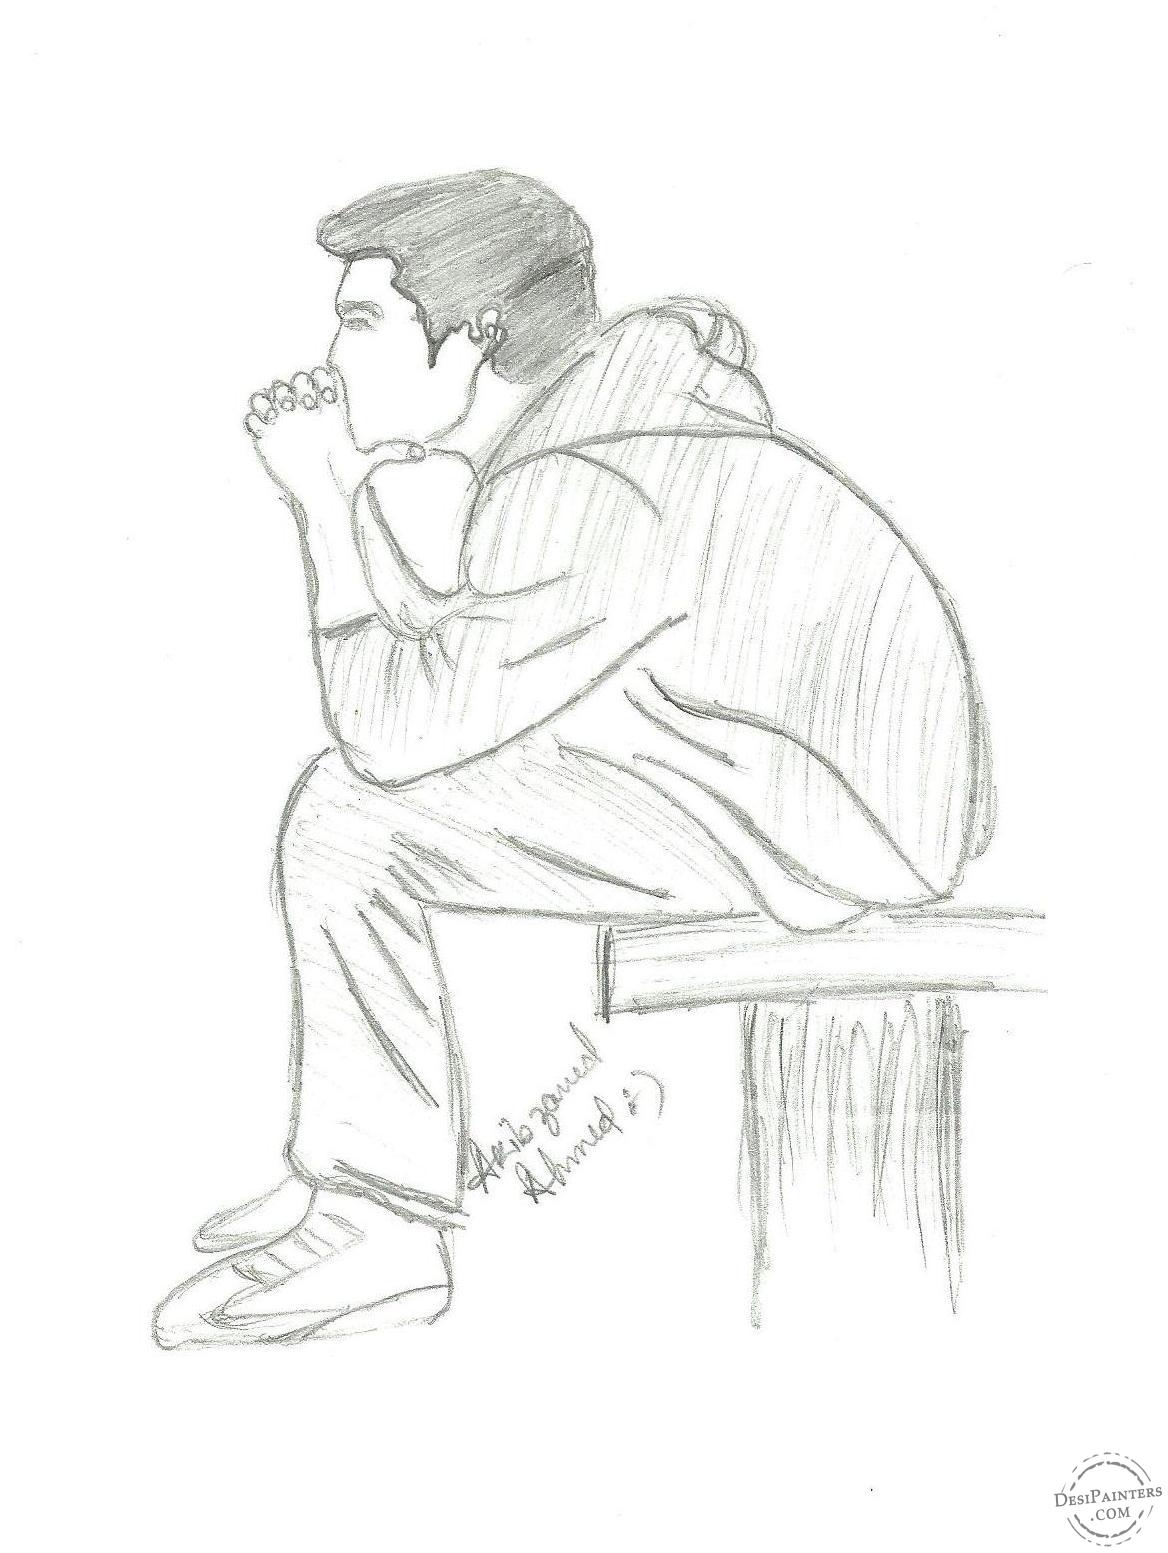 1168x1553 Pencil Sketches Of Lonely Sad Doll Alone Boy In The Rain Pencil